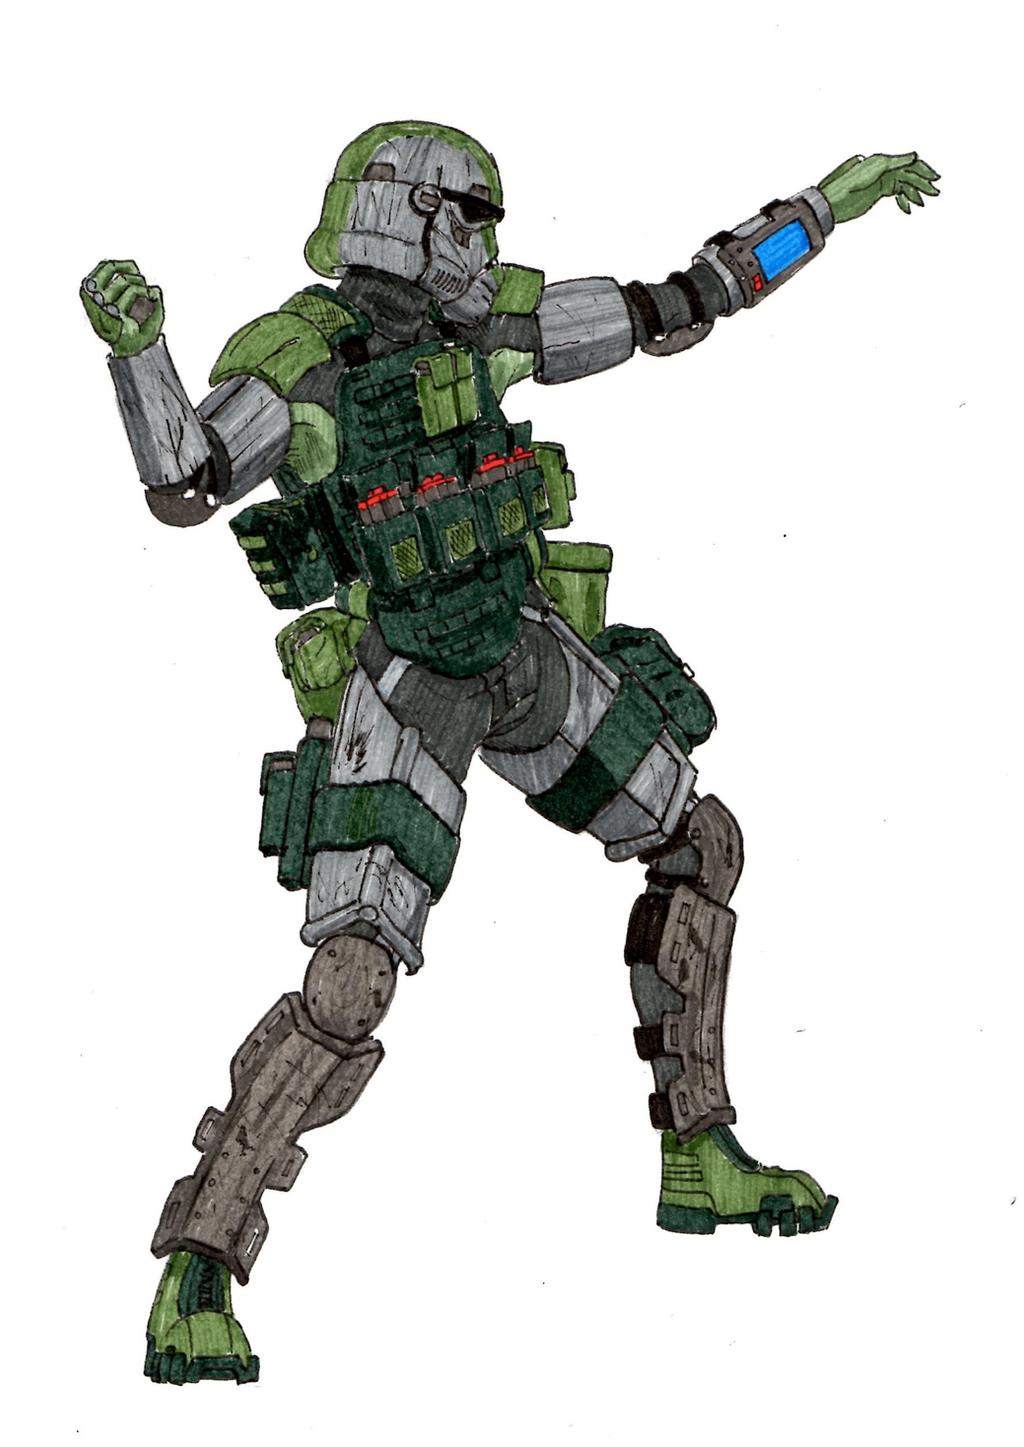 Stormtrooper Ranger By Halonut117 On Deviantart